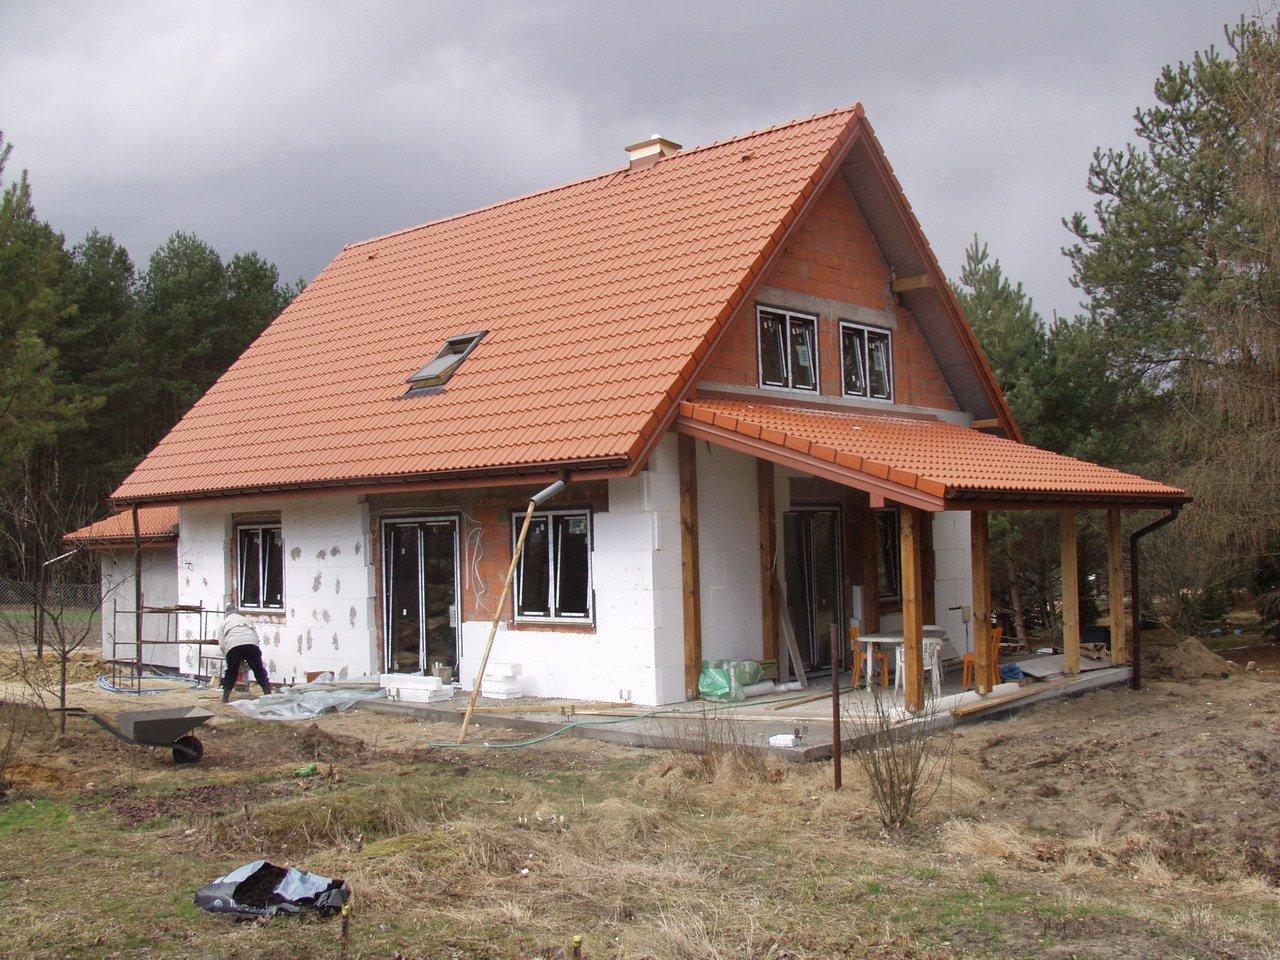 projekt-domu-lesny-zakatek-fot-10-1390379652-s2dm2n2o.jpg